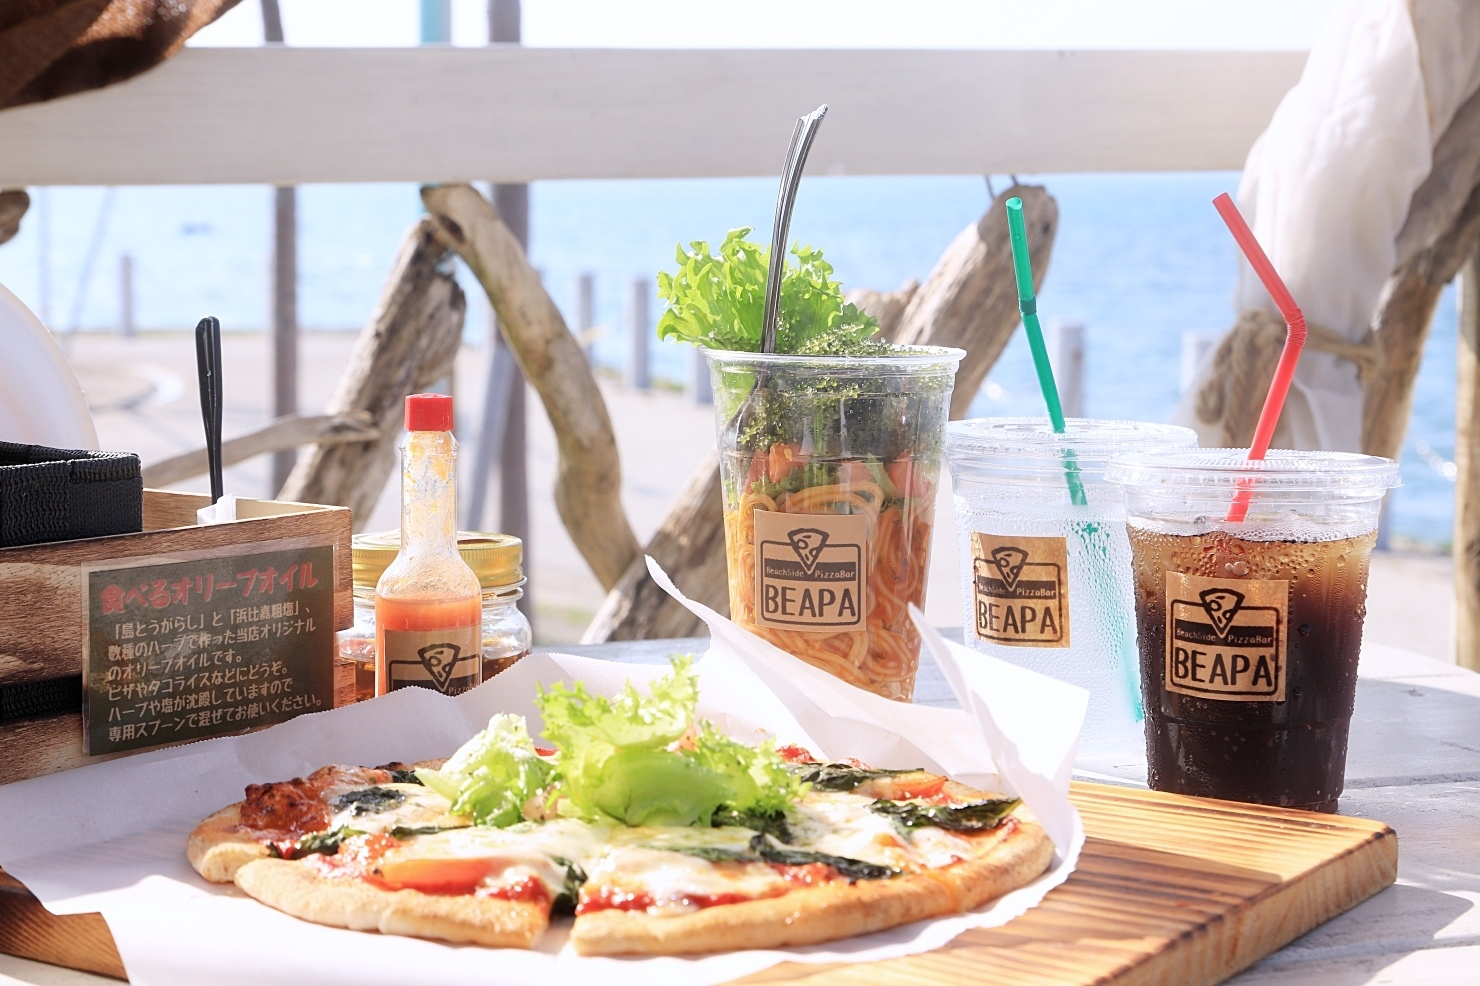 Beachside PizzaBar BEAPA